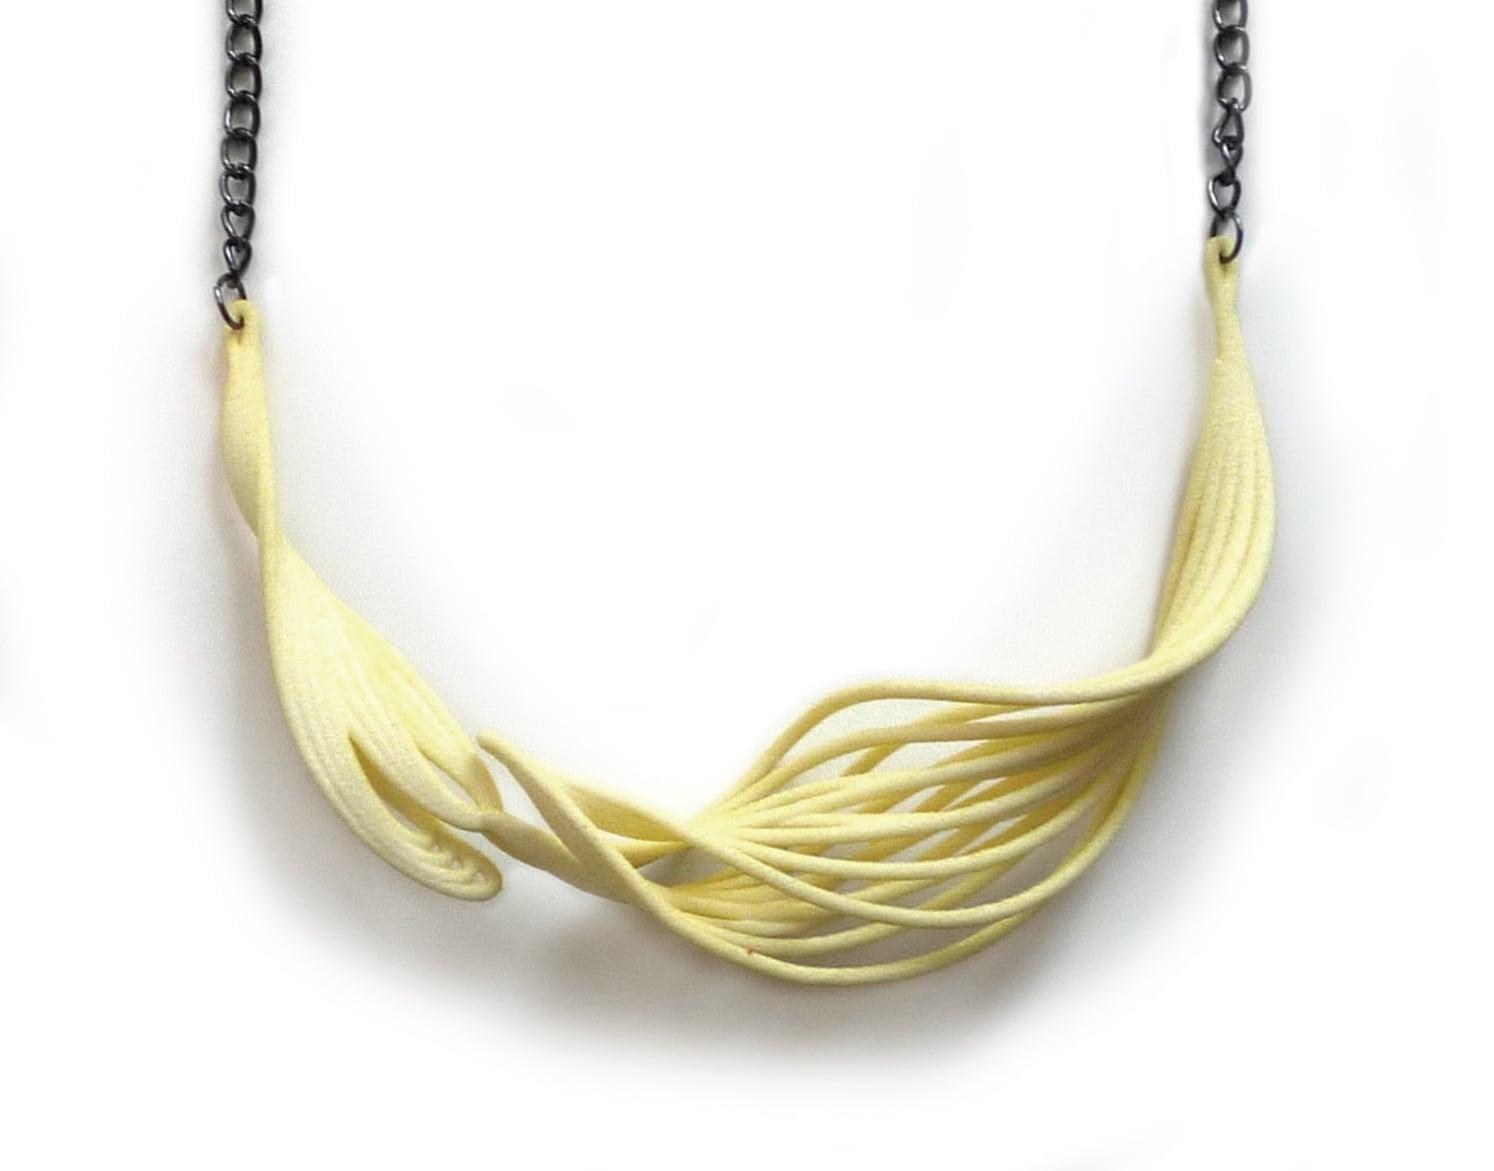 Ryb Necklace   8100: In Nylon $18